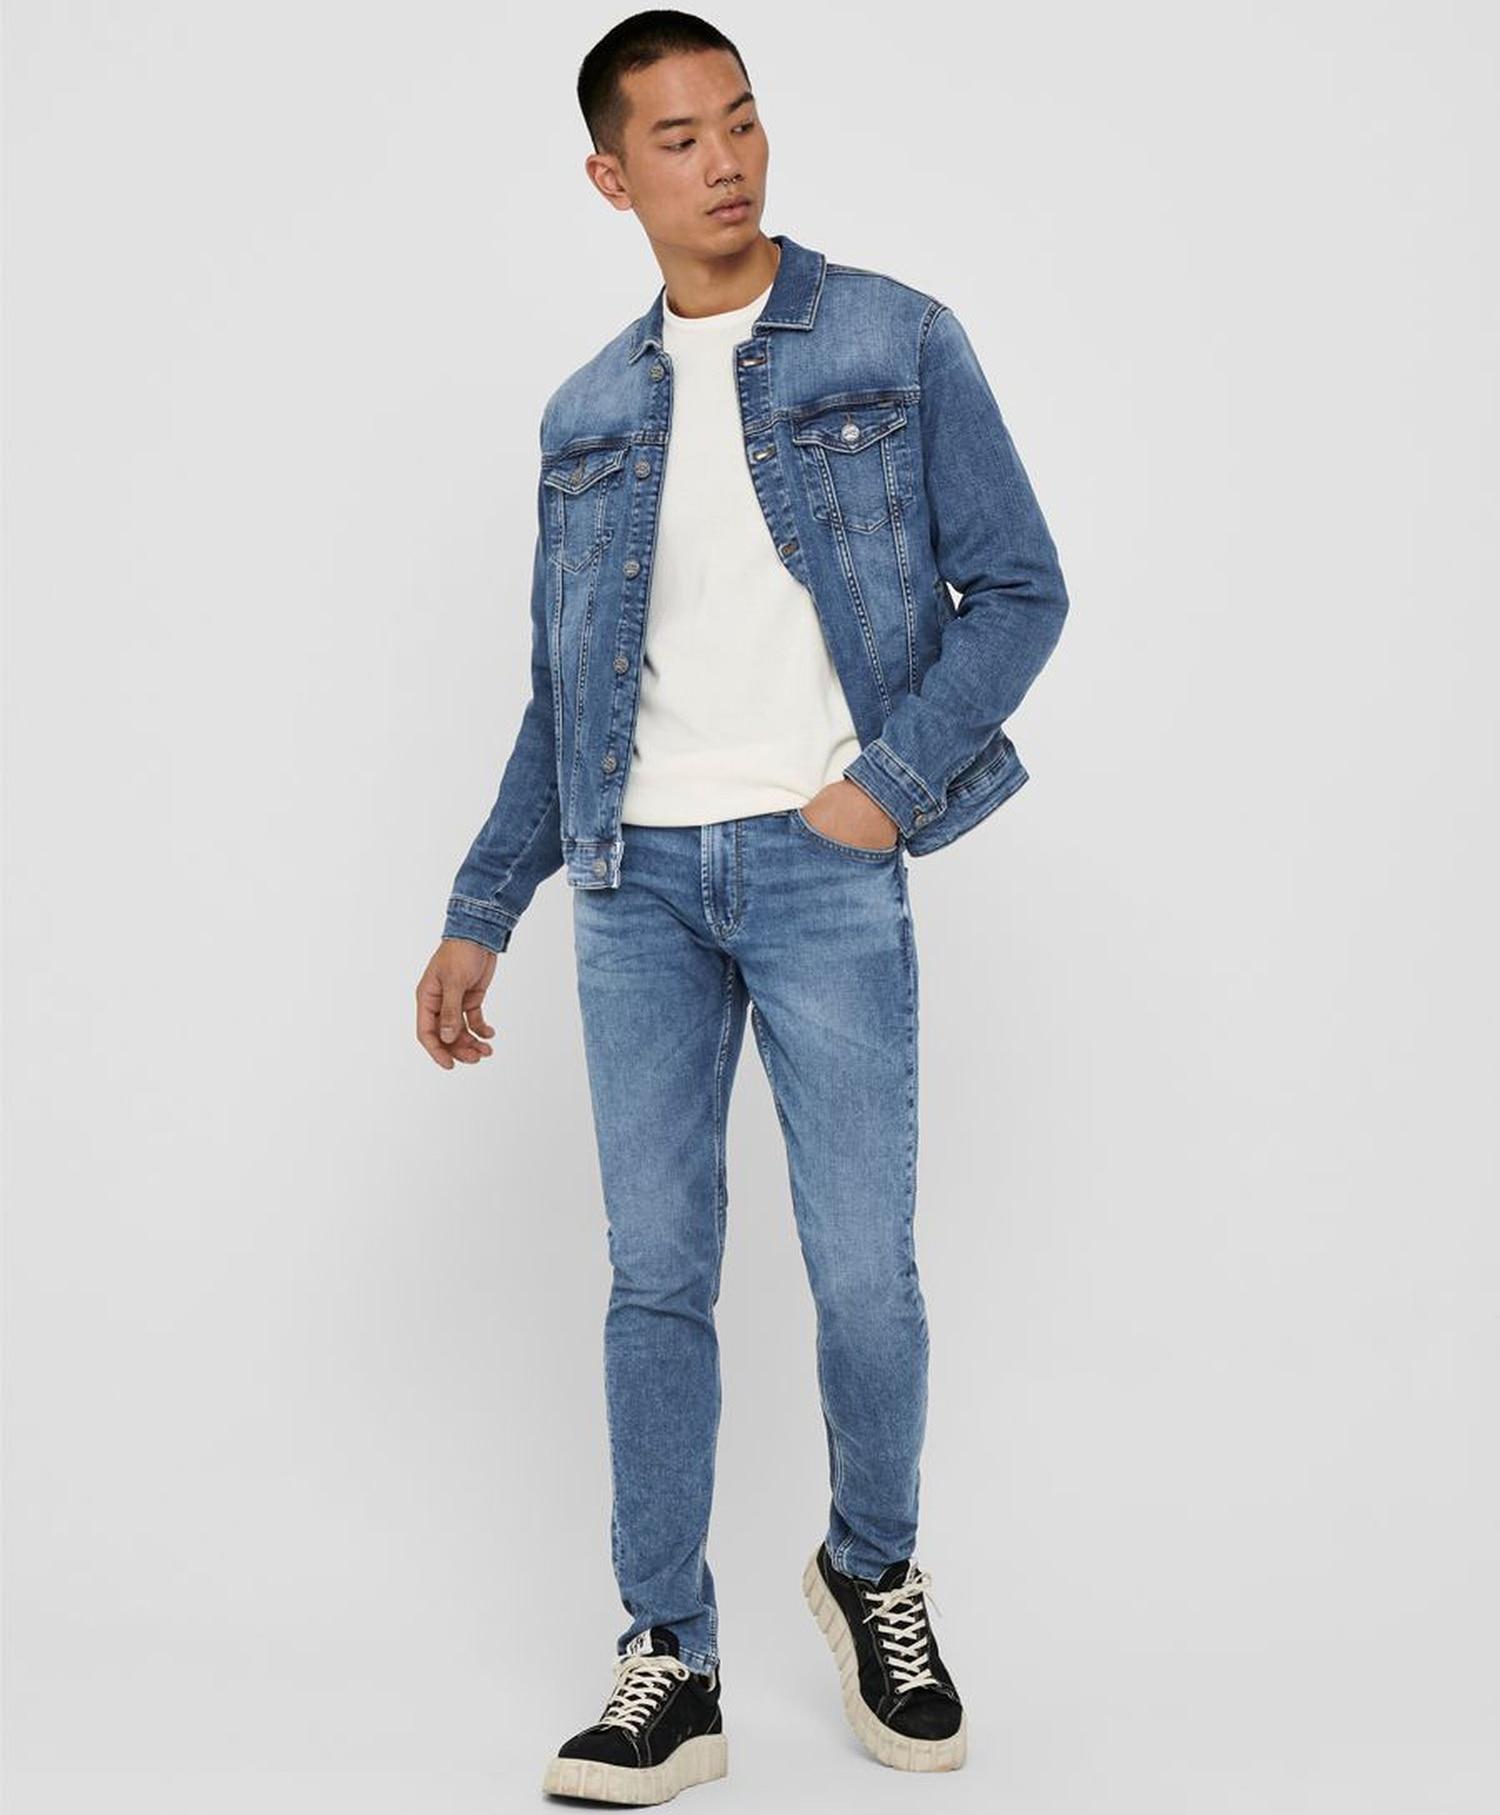 Only Denim Jacket